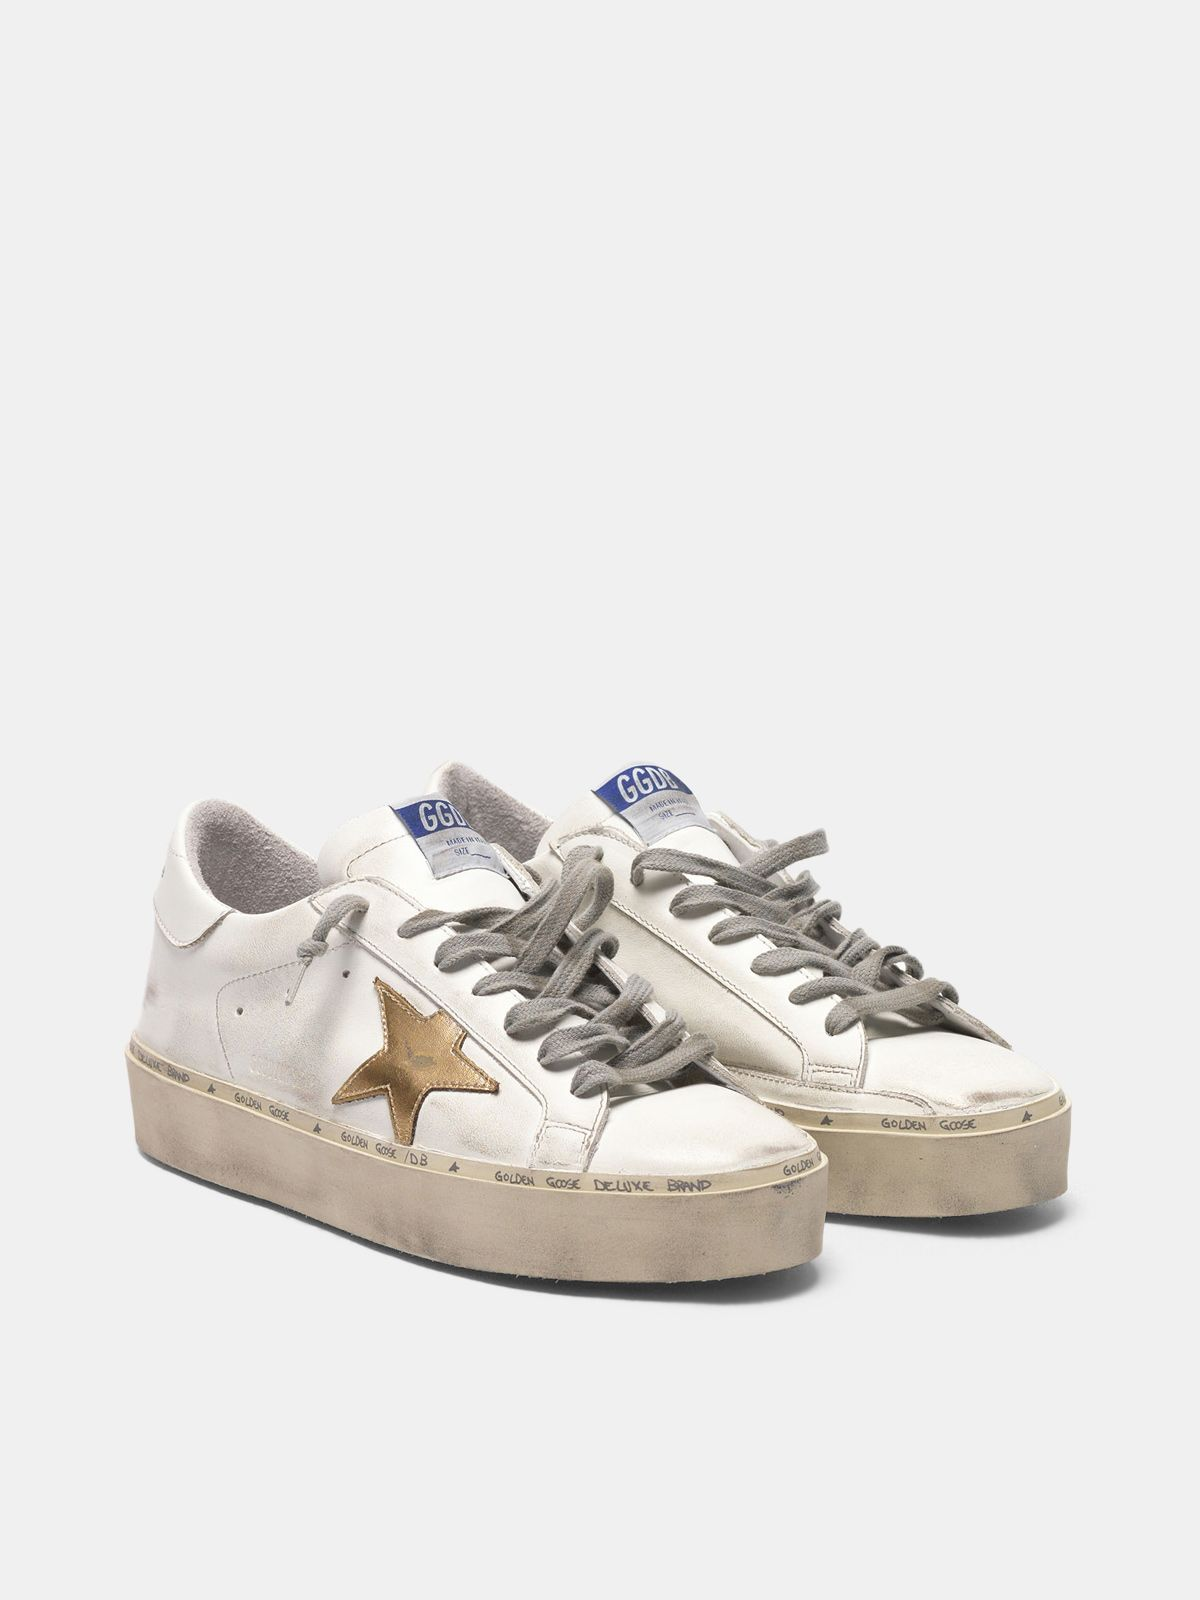 Golden Goose - Sneakers Hi Star in pelle con stella dorata in